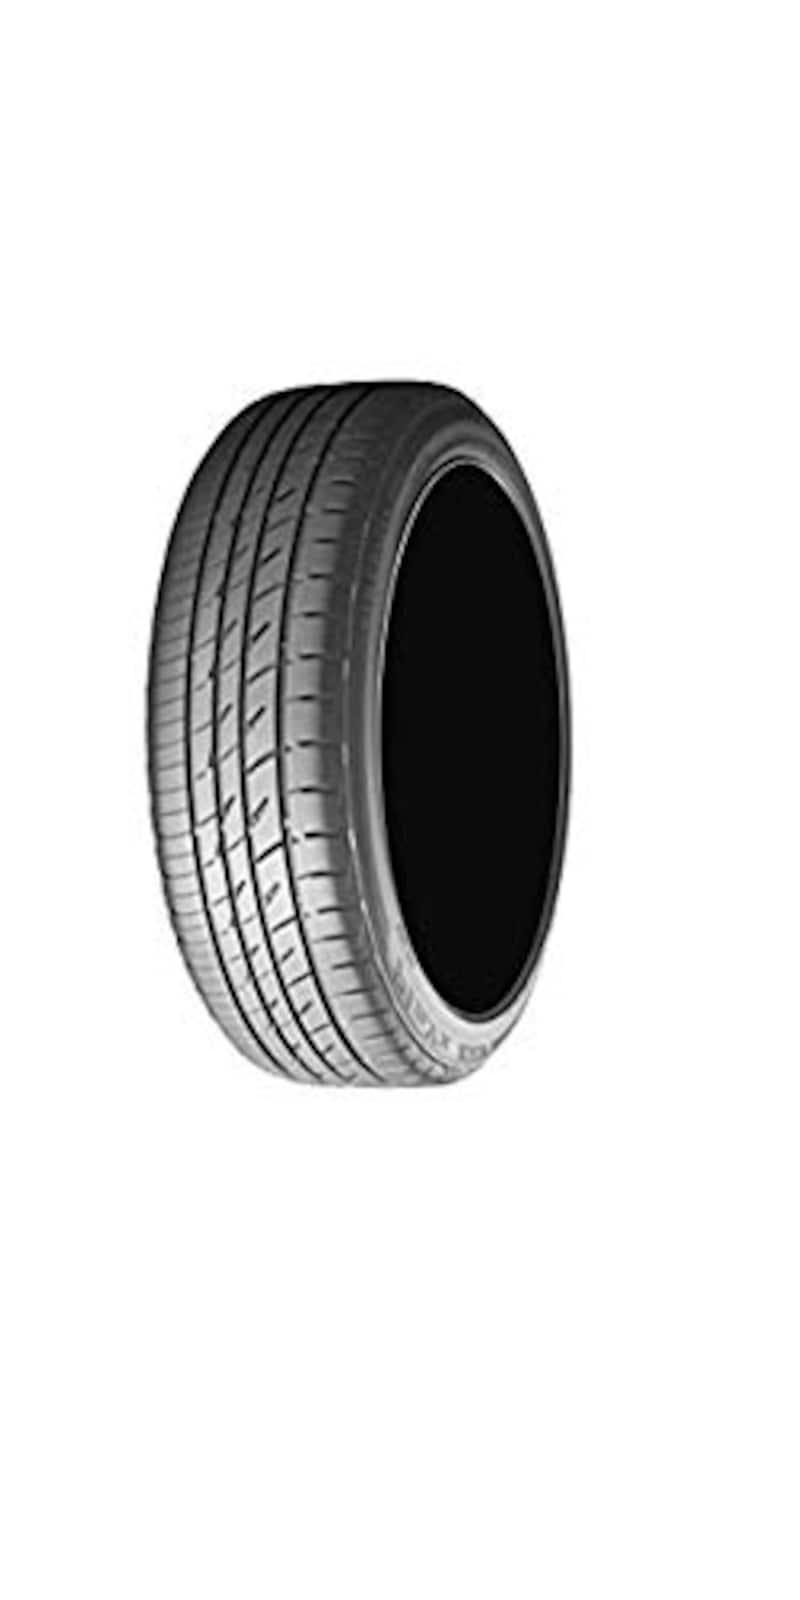 BRIDGESTONE(ブリヂストン),低燃費タイヤ Playz PX